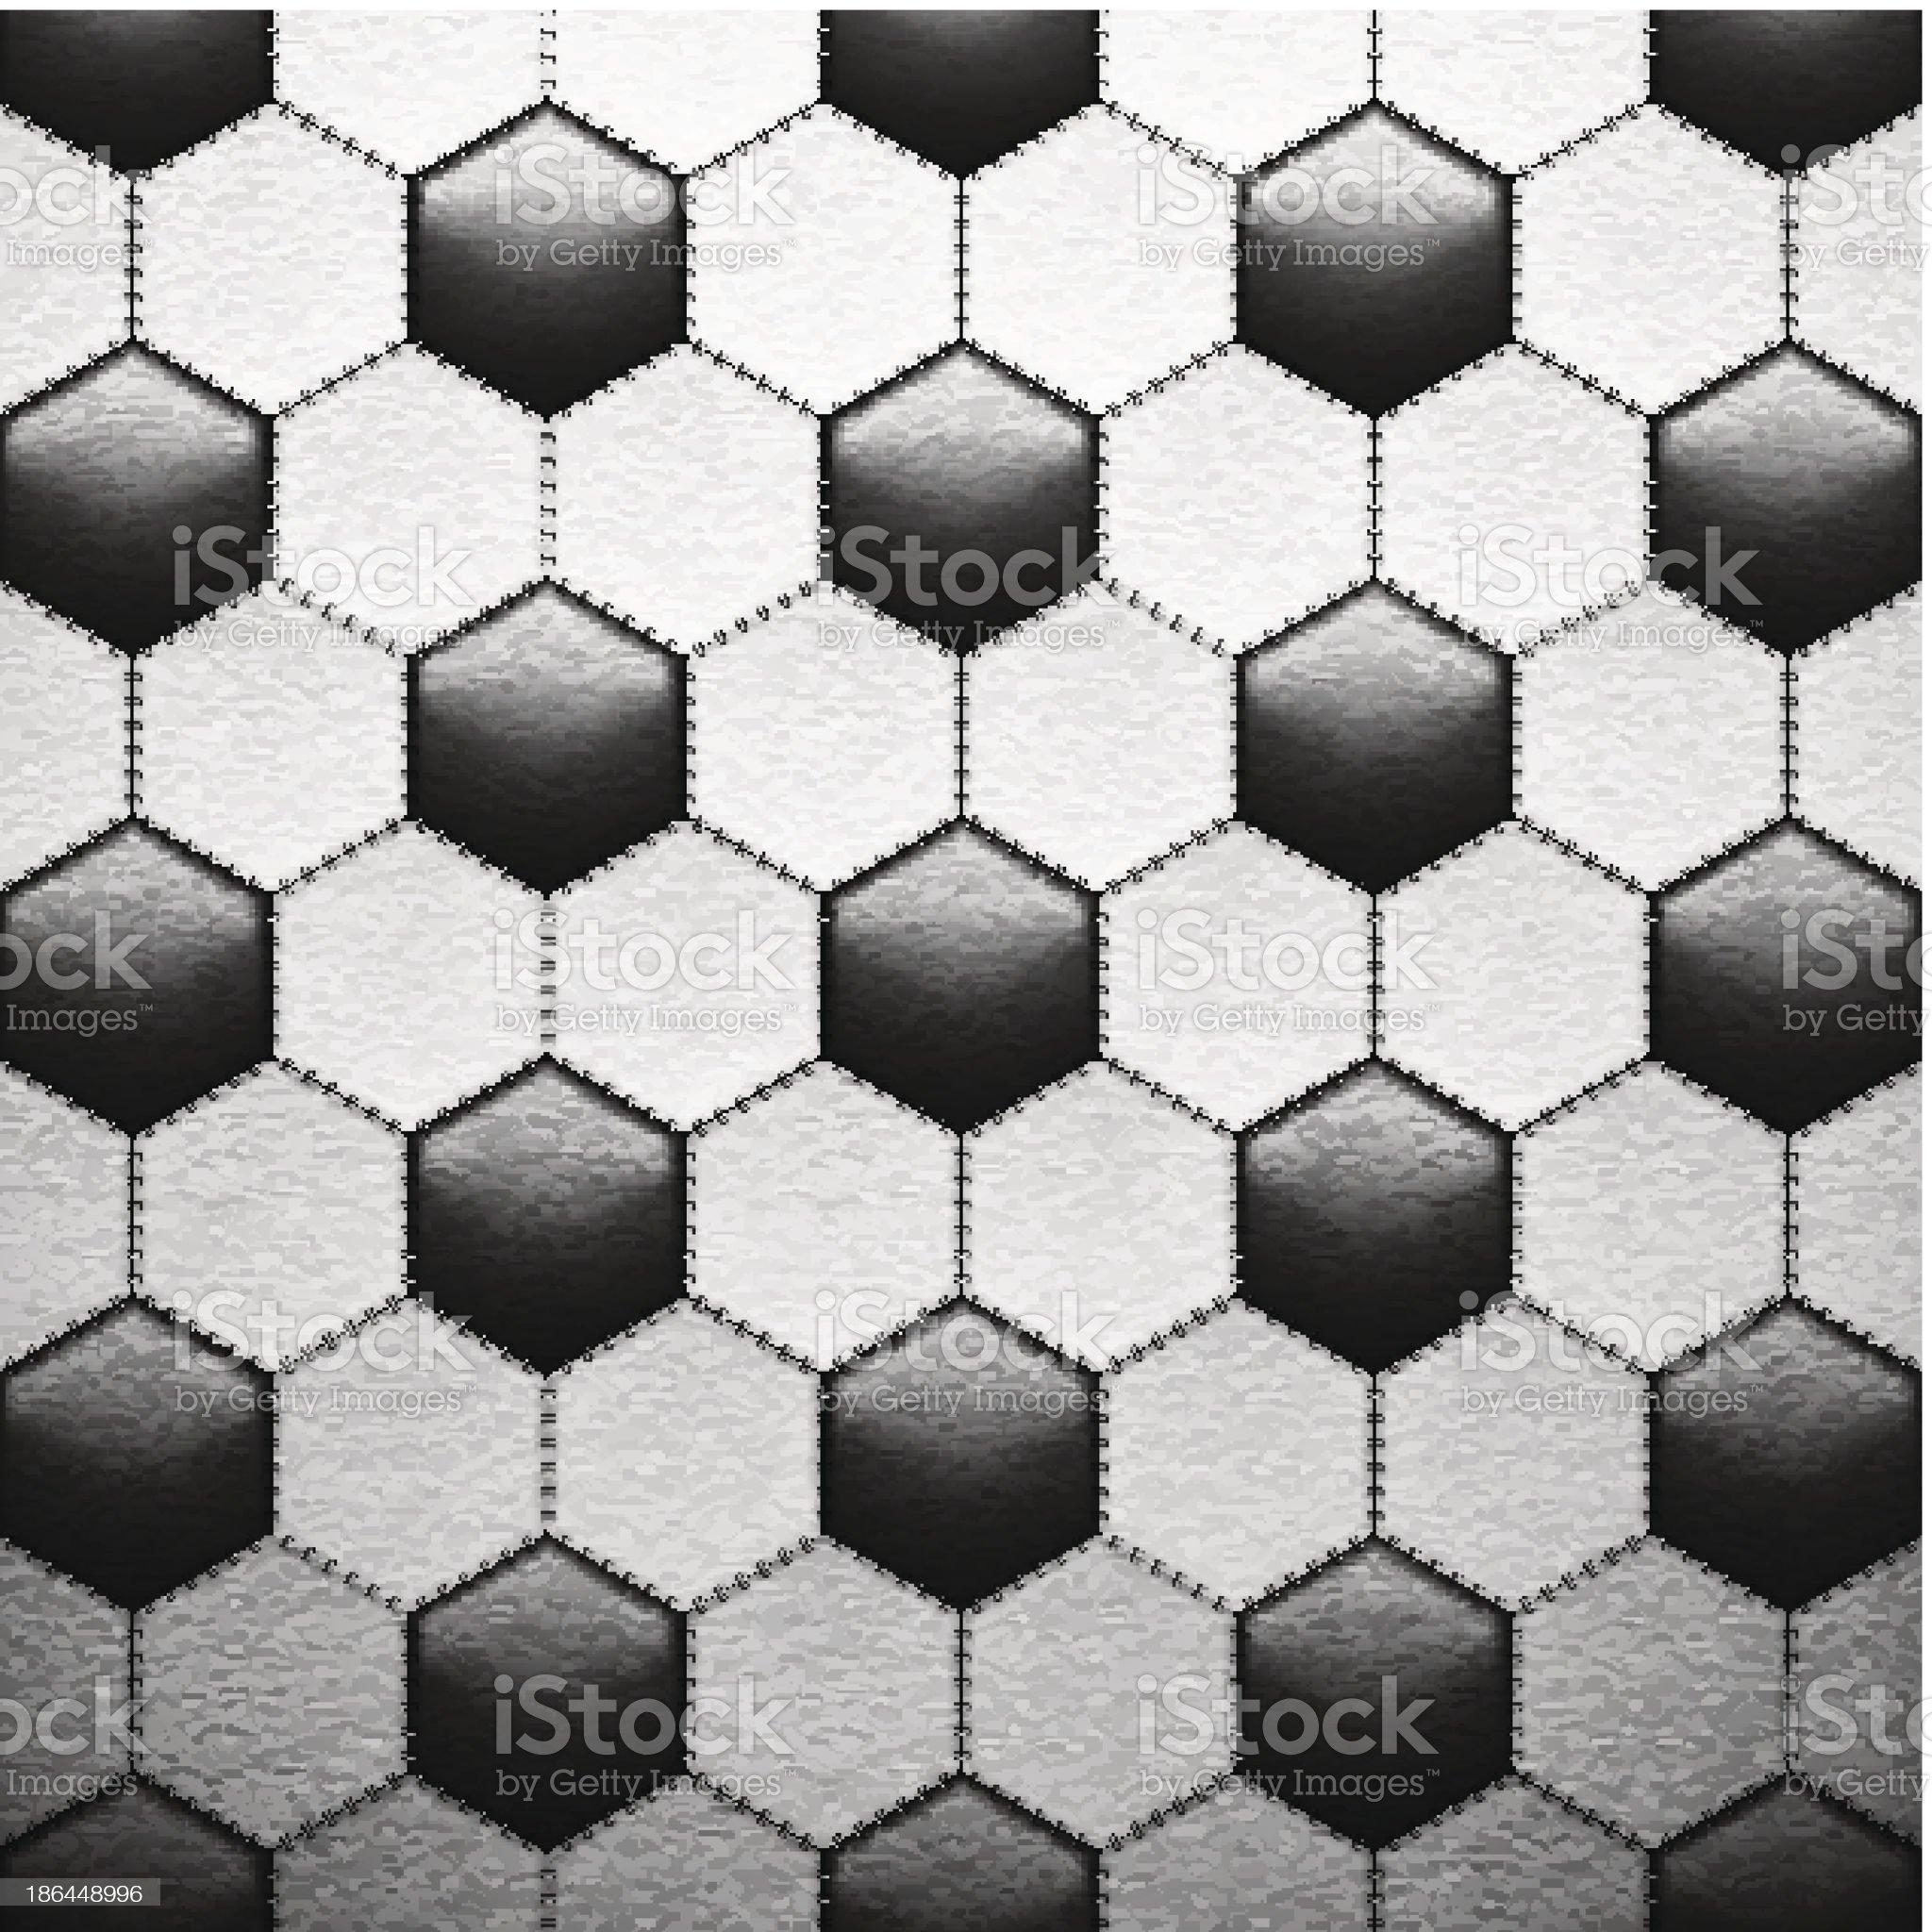 Texture of soccer ball royalty-free stock vector art